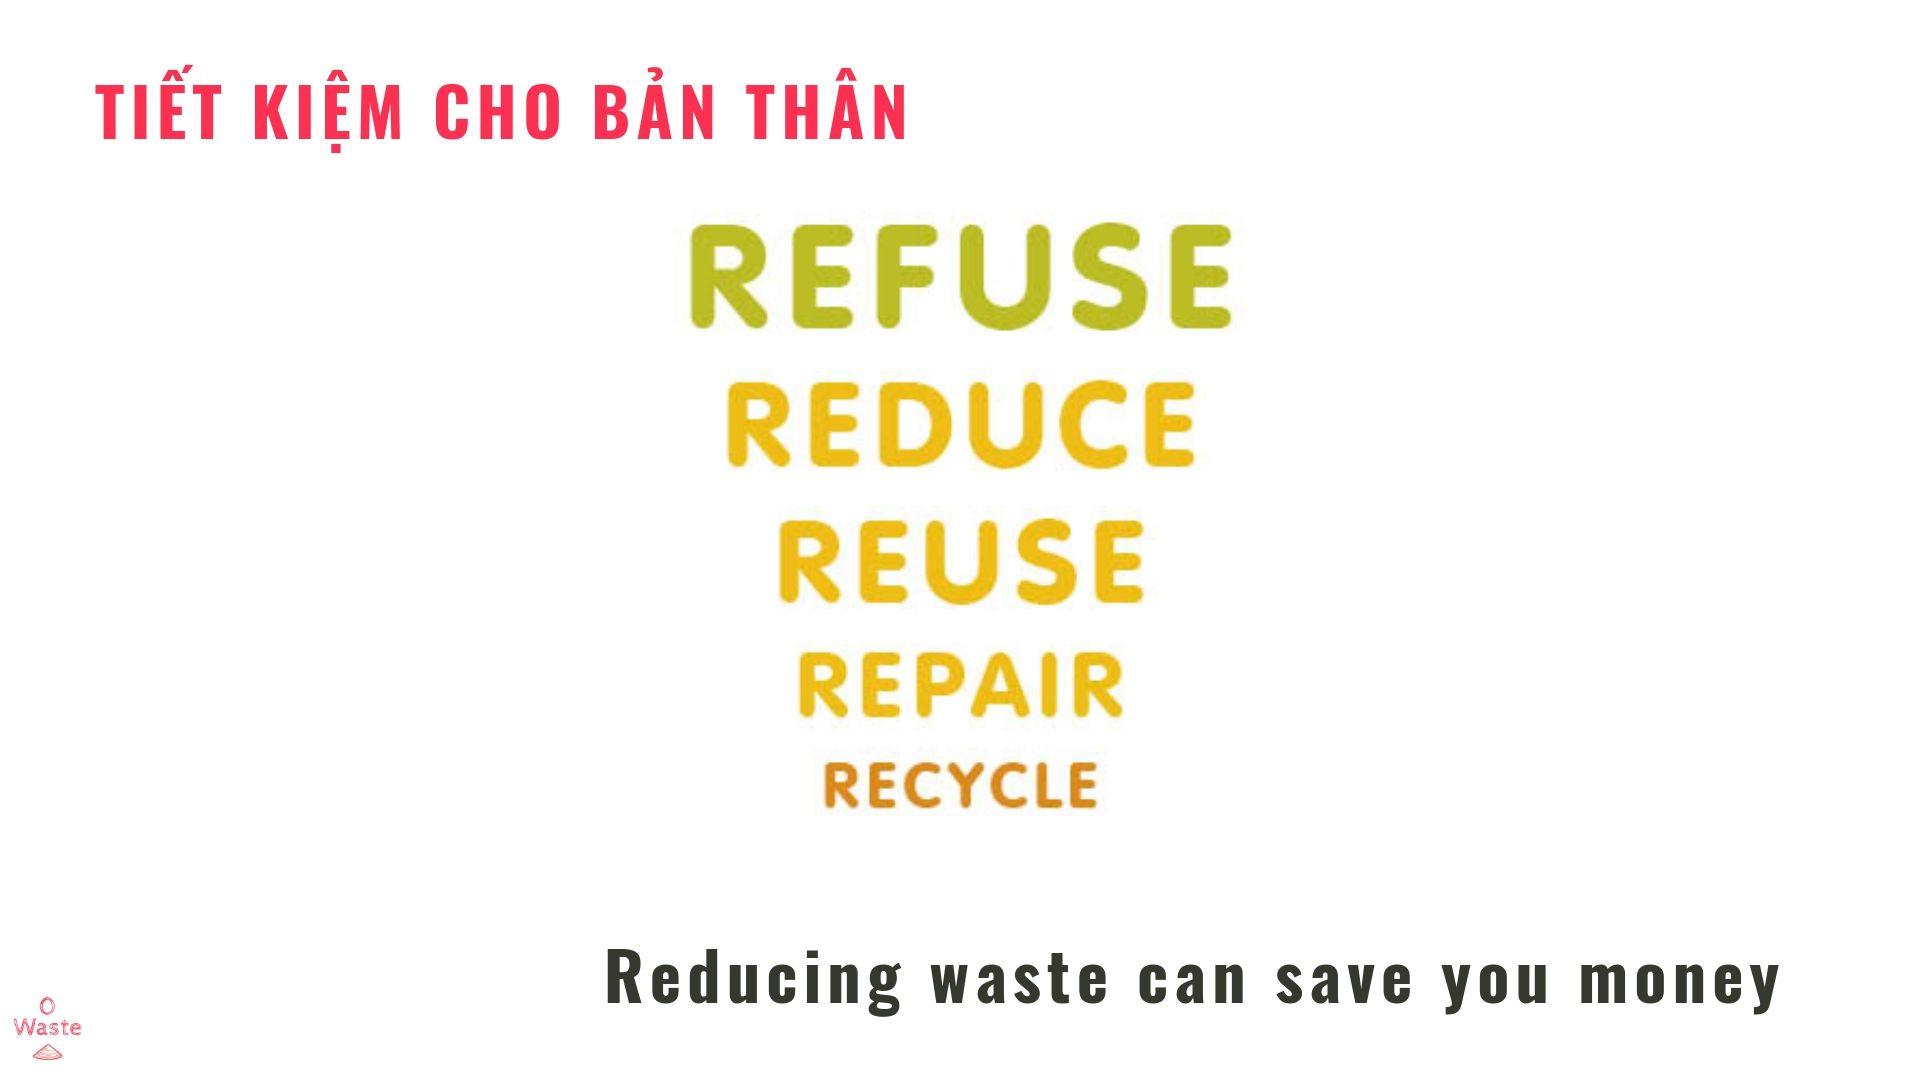 Zero Waste Classes and Presentations - Zero Waste Saigon